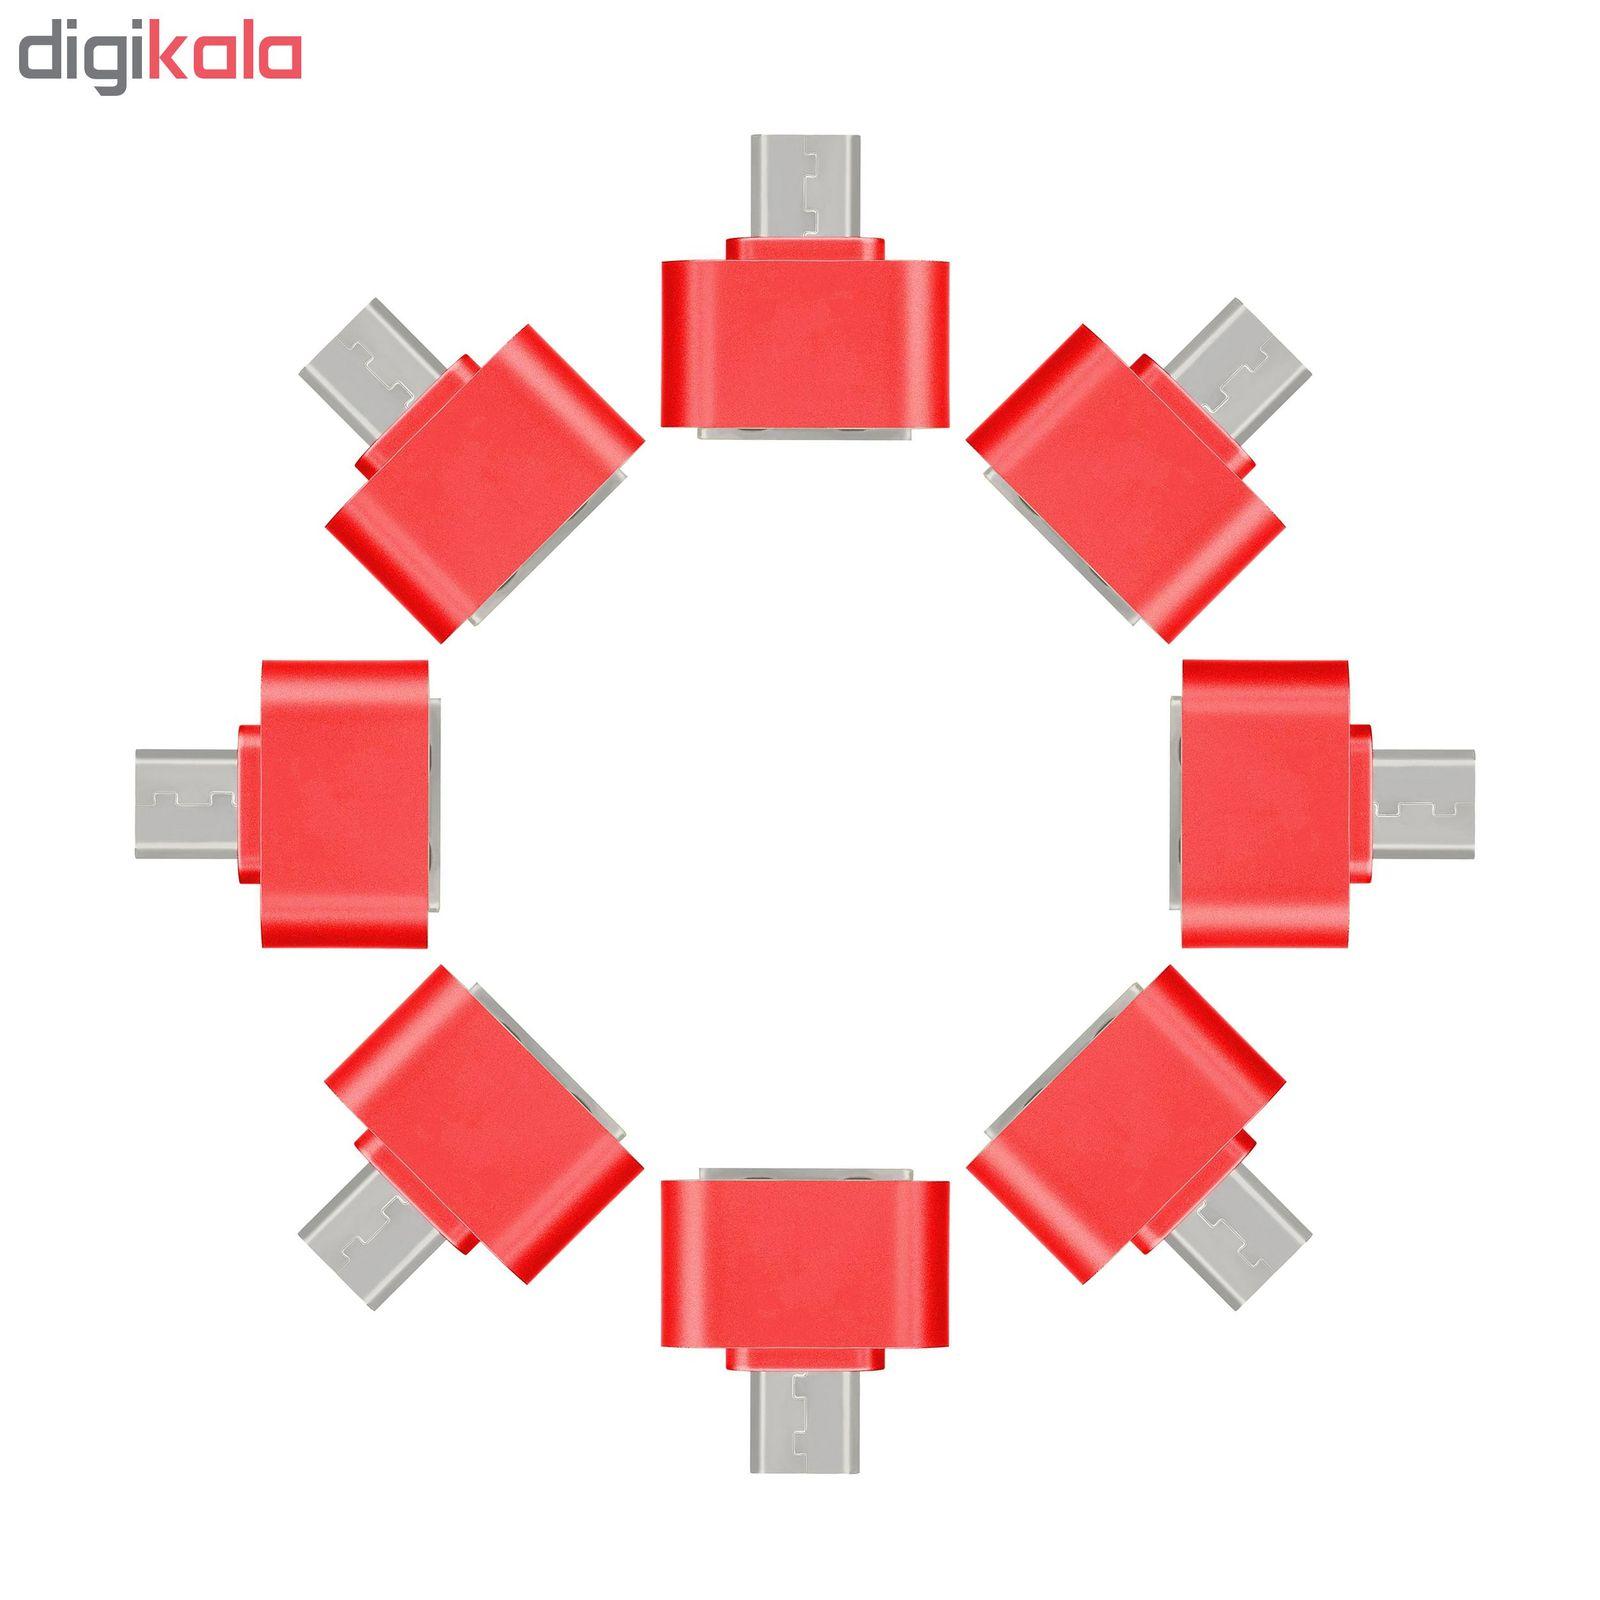 مبدل microUSB به USB مدل DST-O8 بسته 8 عددی main 1 7